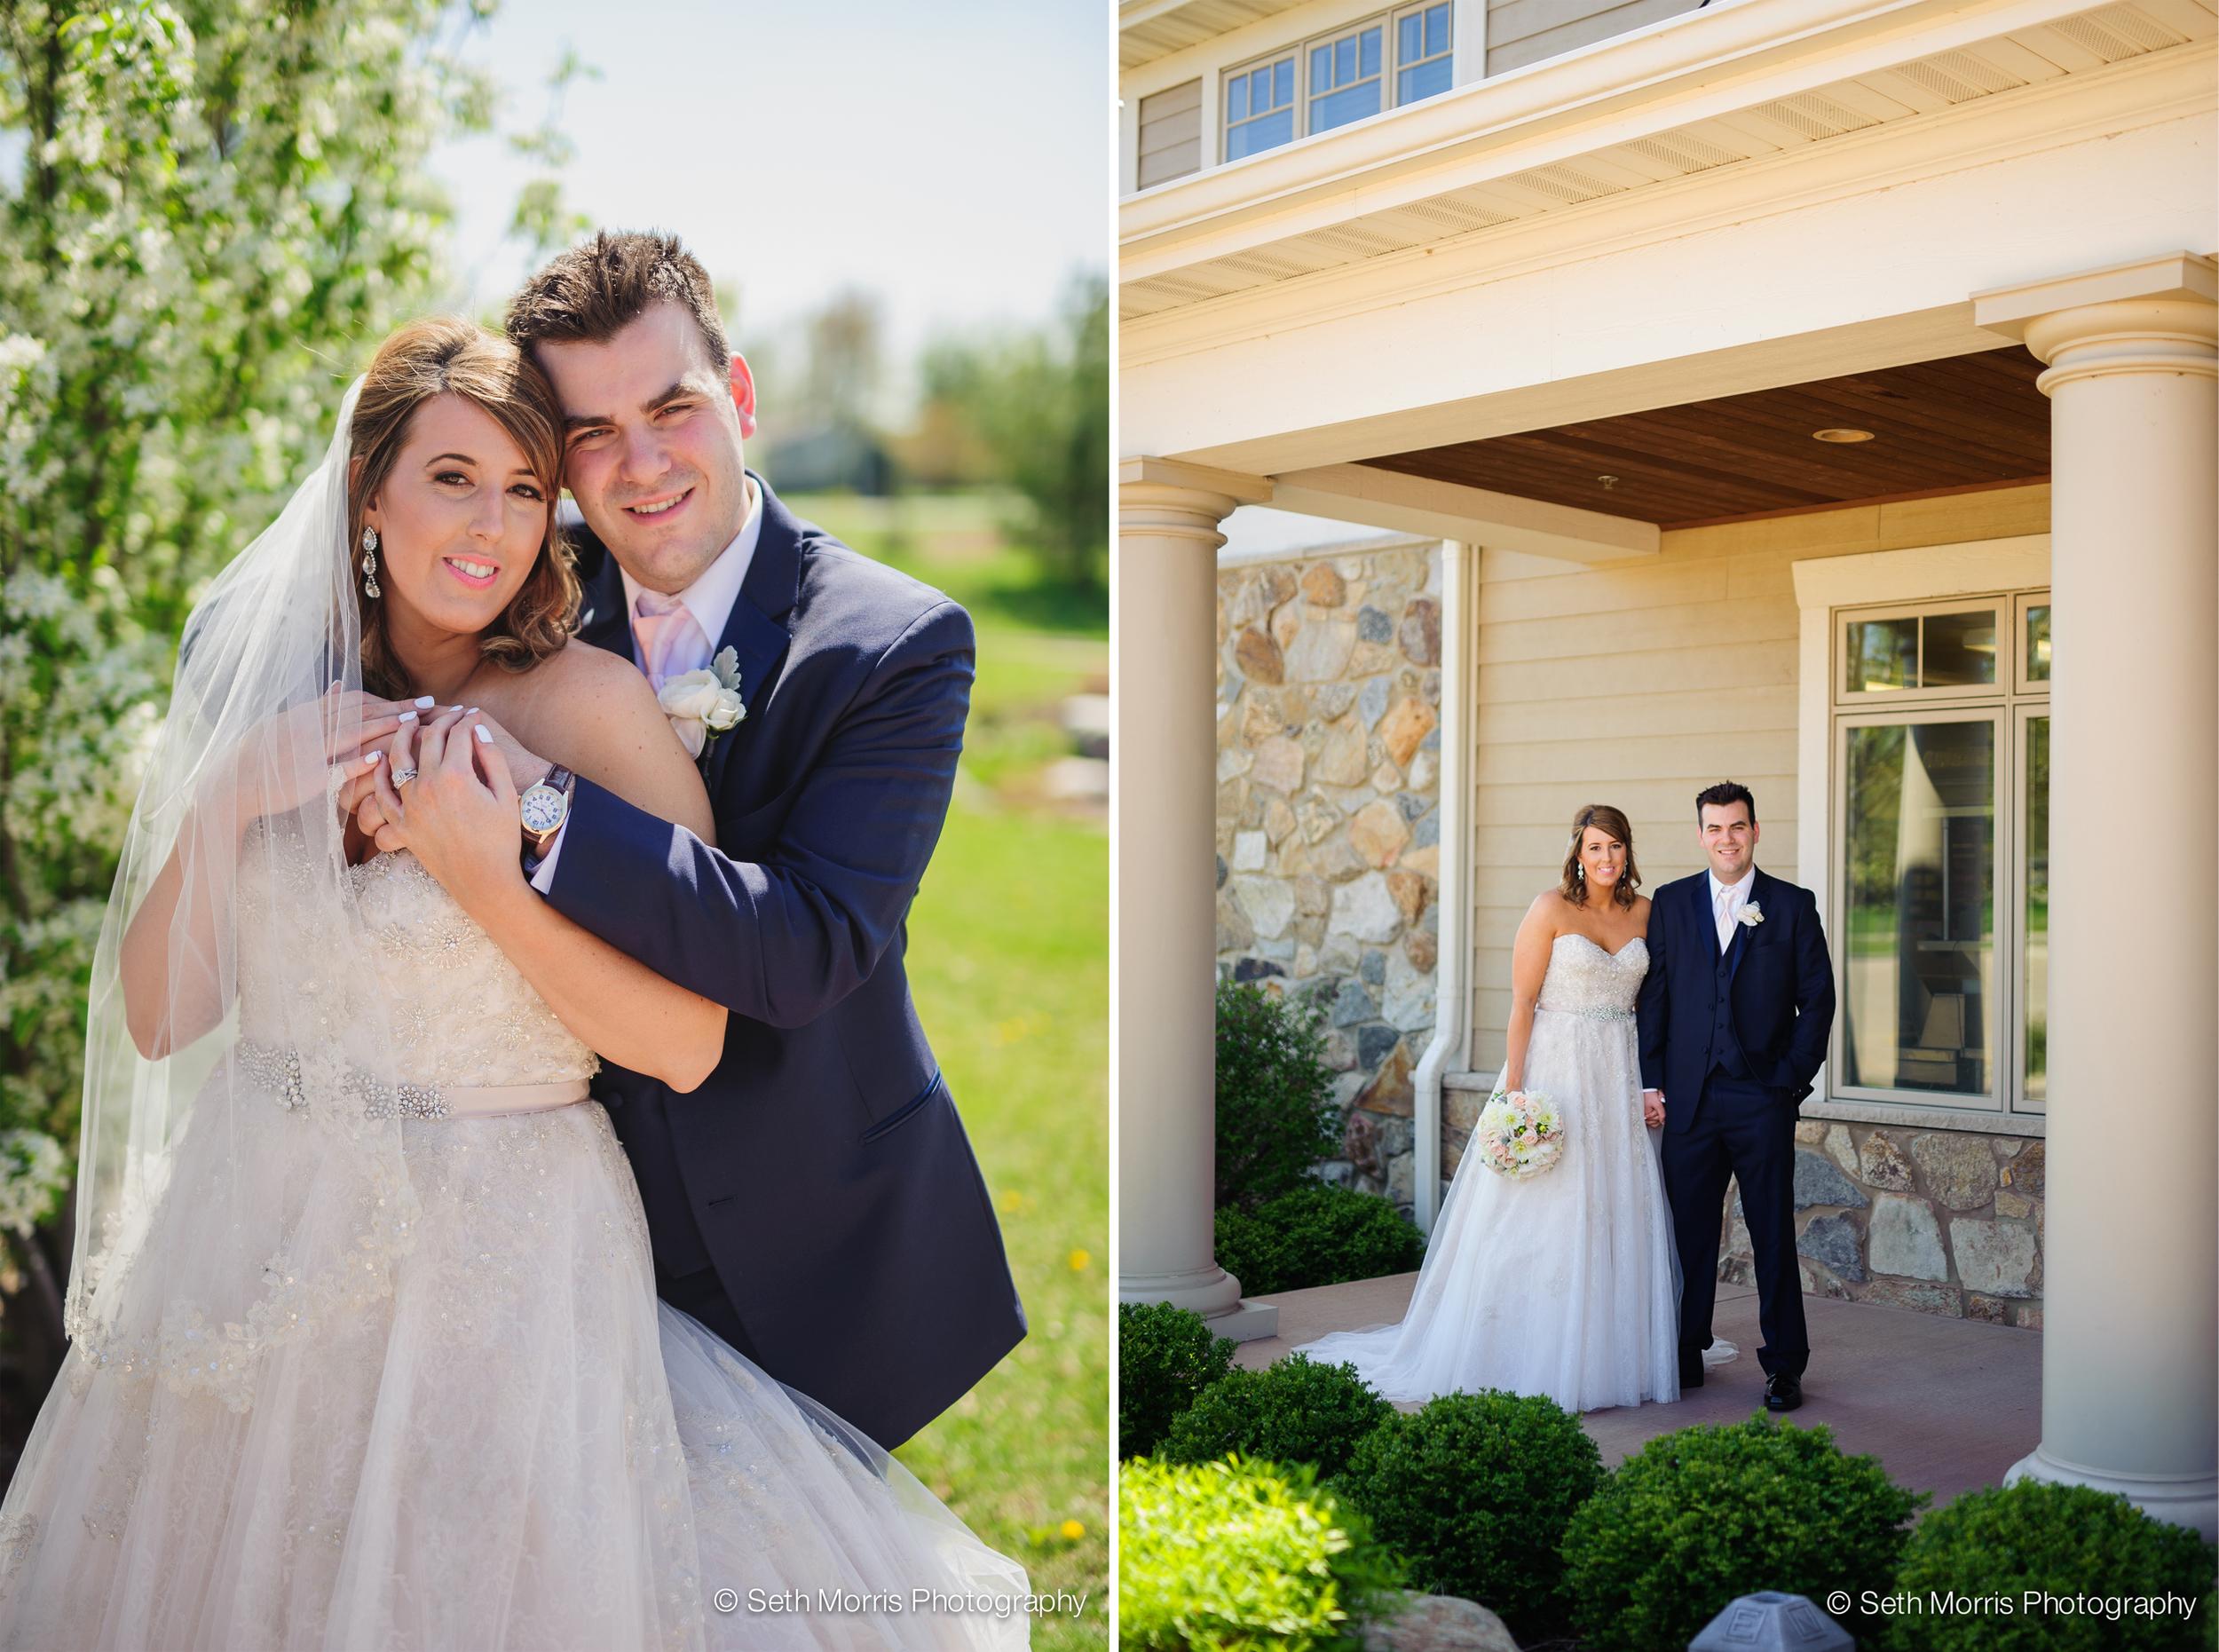 metamora-fields-wedding-photographer-peoria-125.jpg